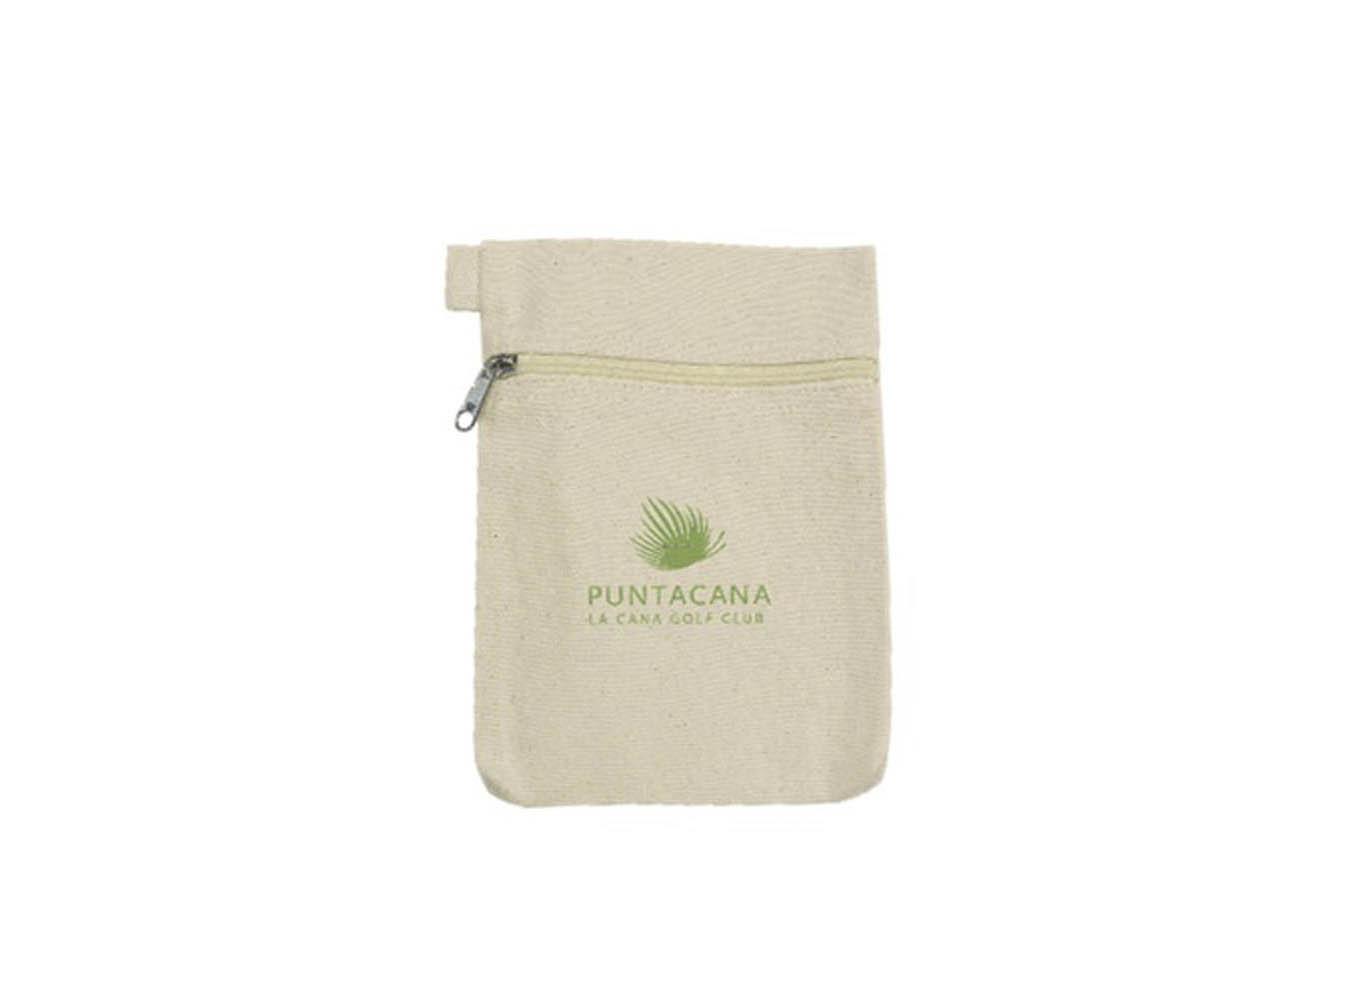 Custom Cotton Canvas Small Zipper Pouch